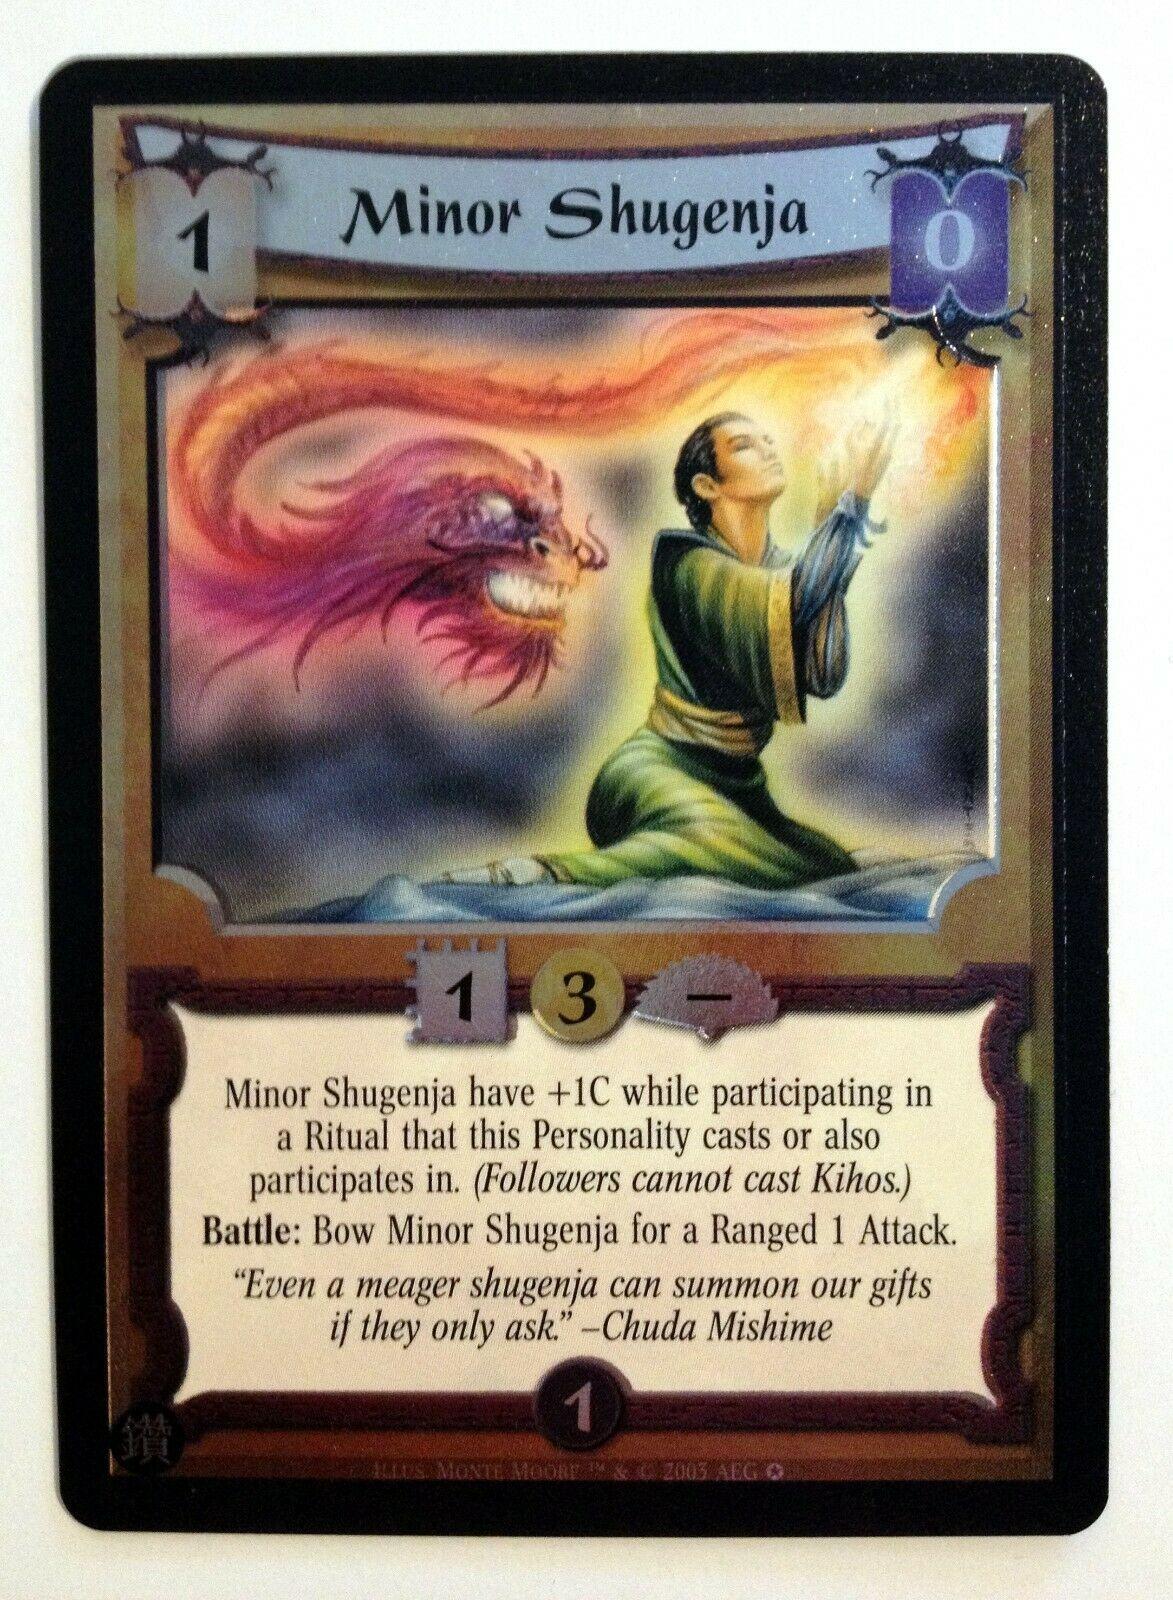 File:Minor Shugenja-card3.jpg